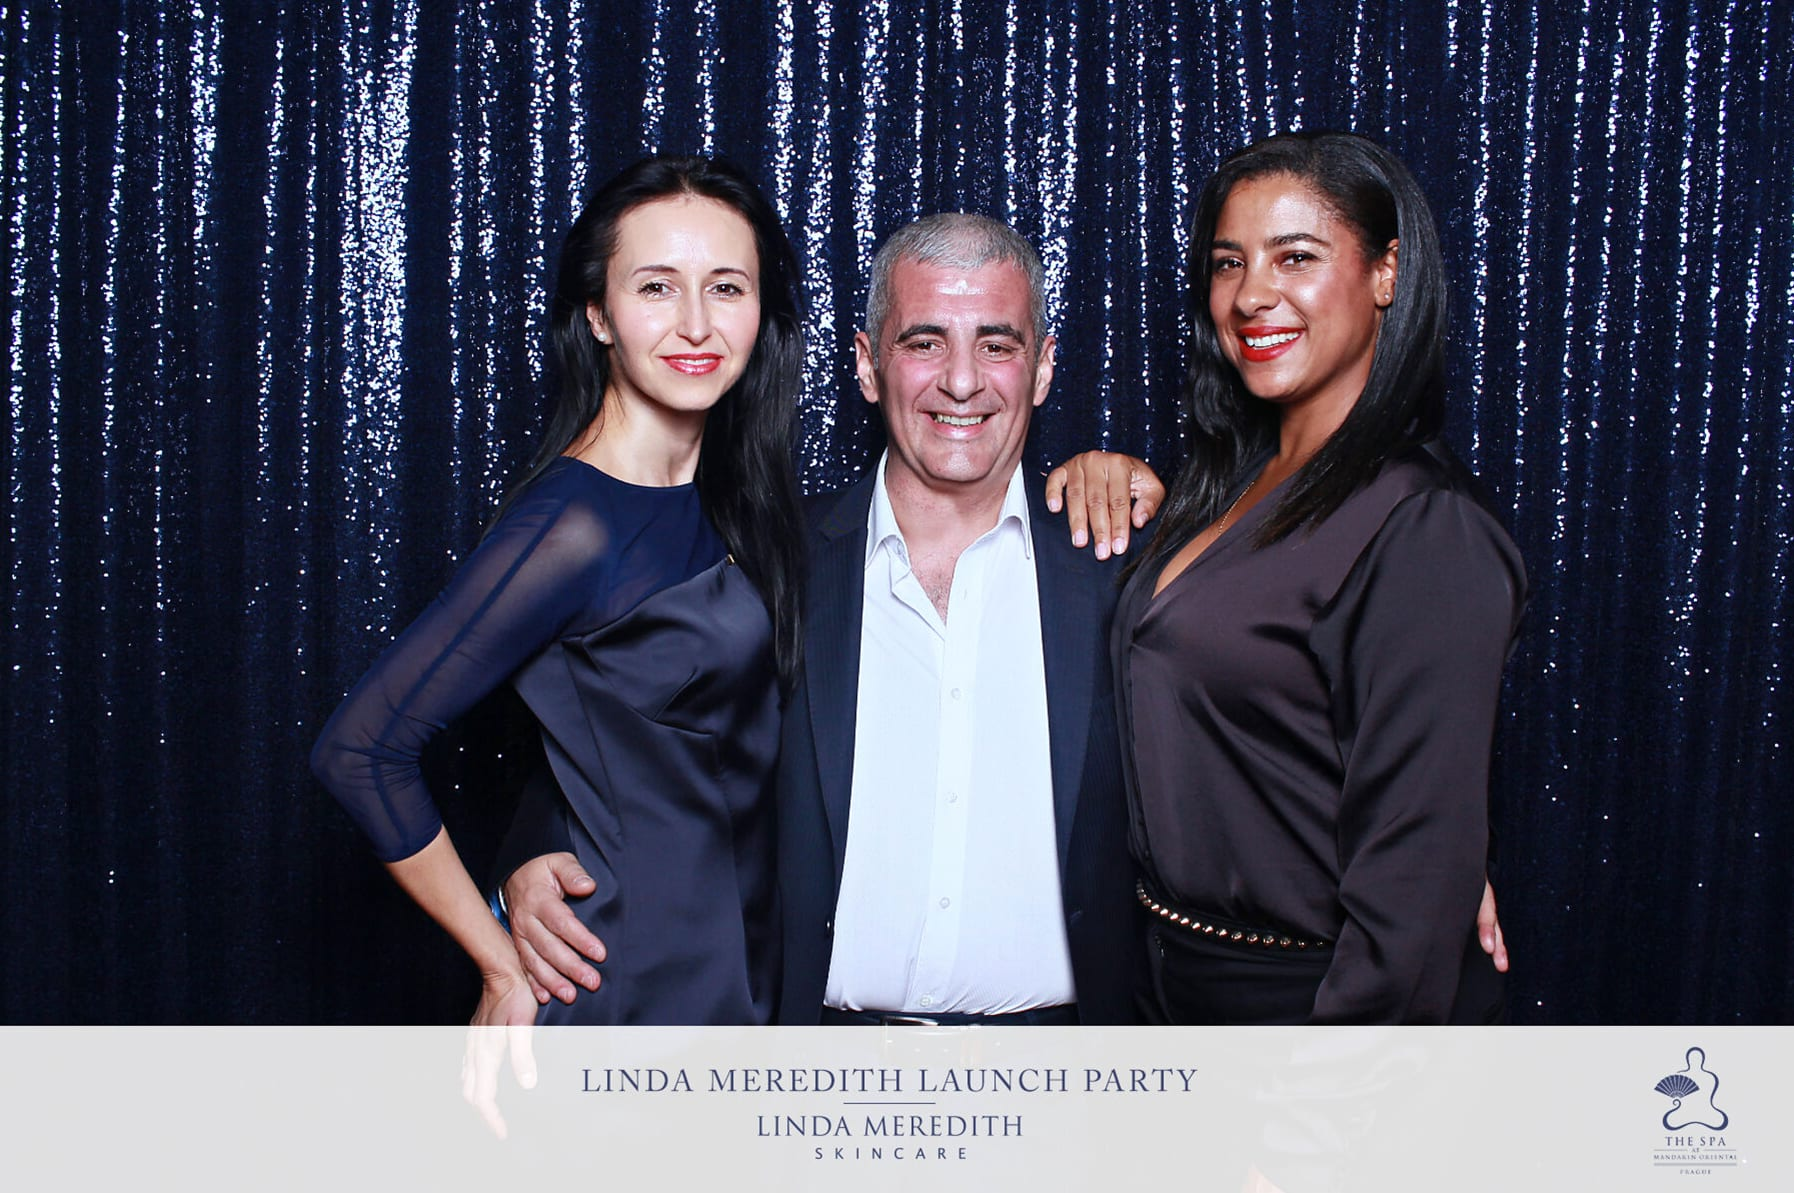 fotokoutek-linda-meredith-launch-party-10-10-2018-503007